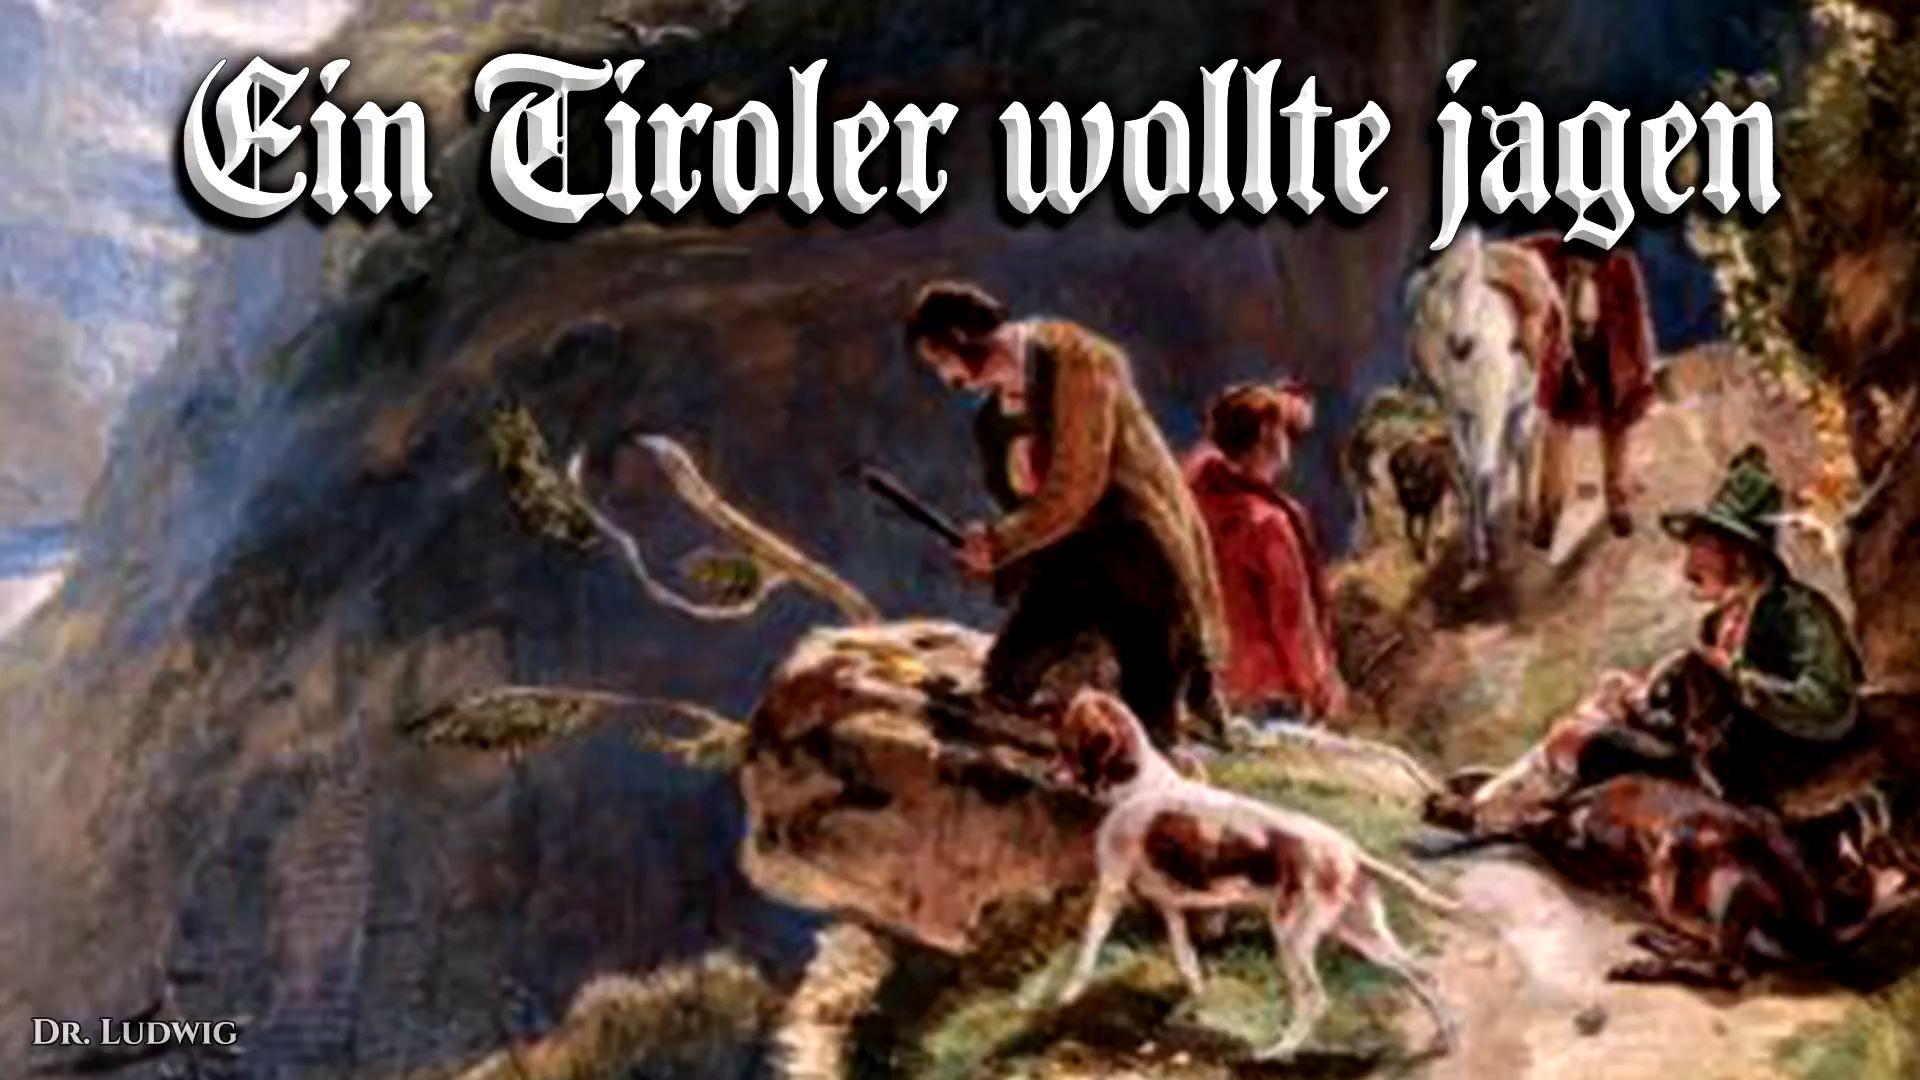 Ein Tiroler wollte jagen[一个蒂罗尔人想要去狩猎][奥地利民歌]+英语歌词]